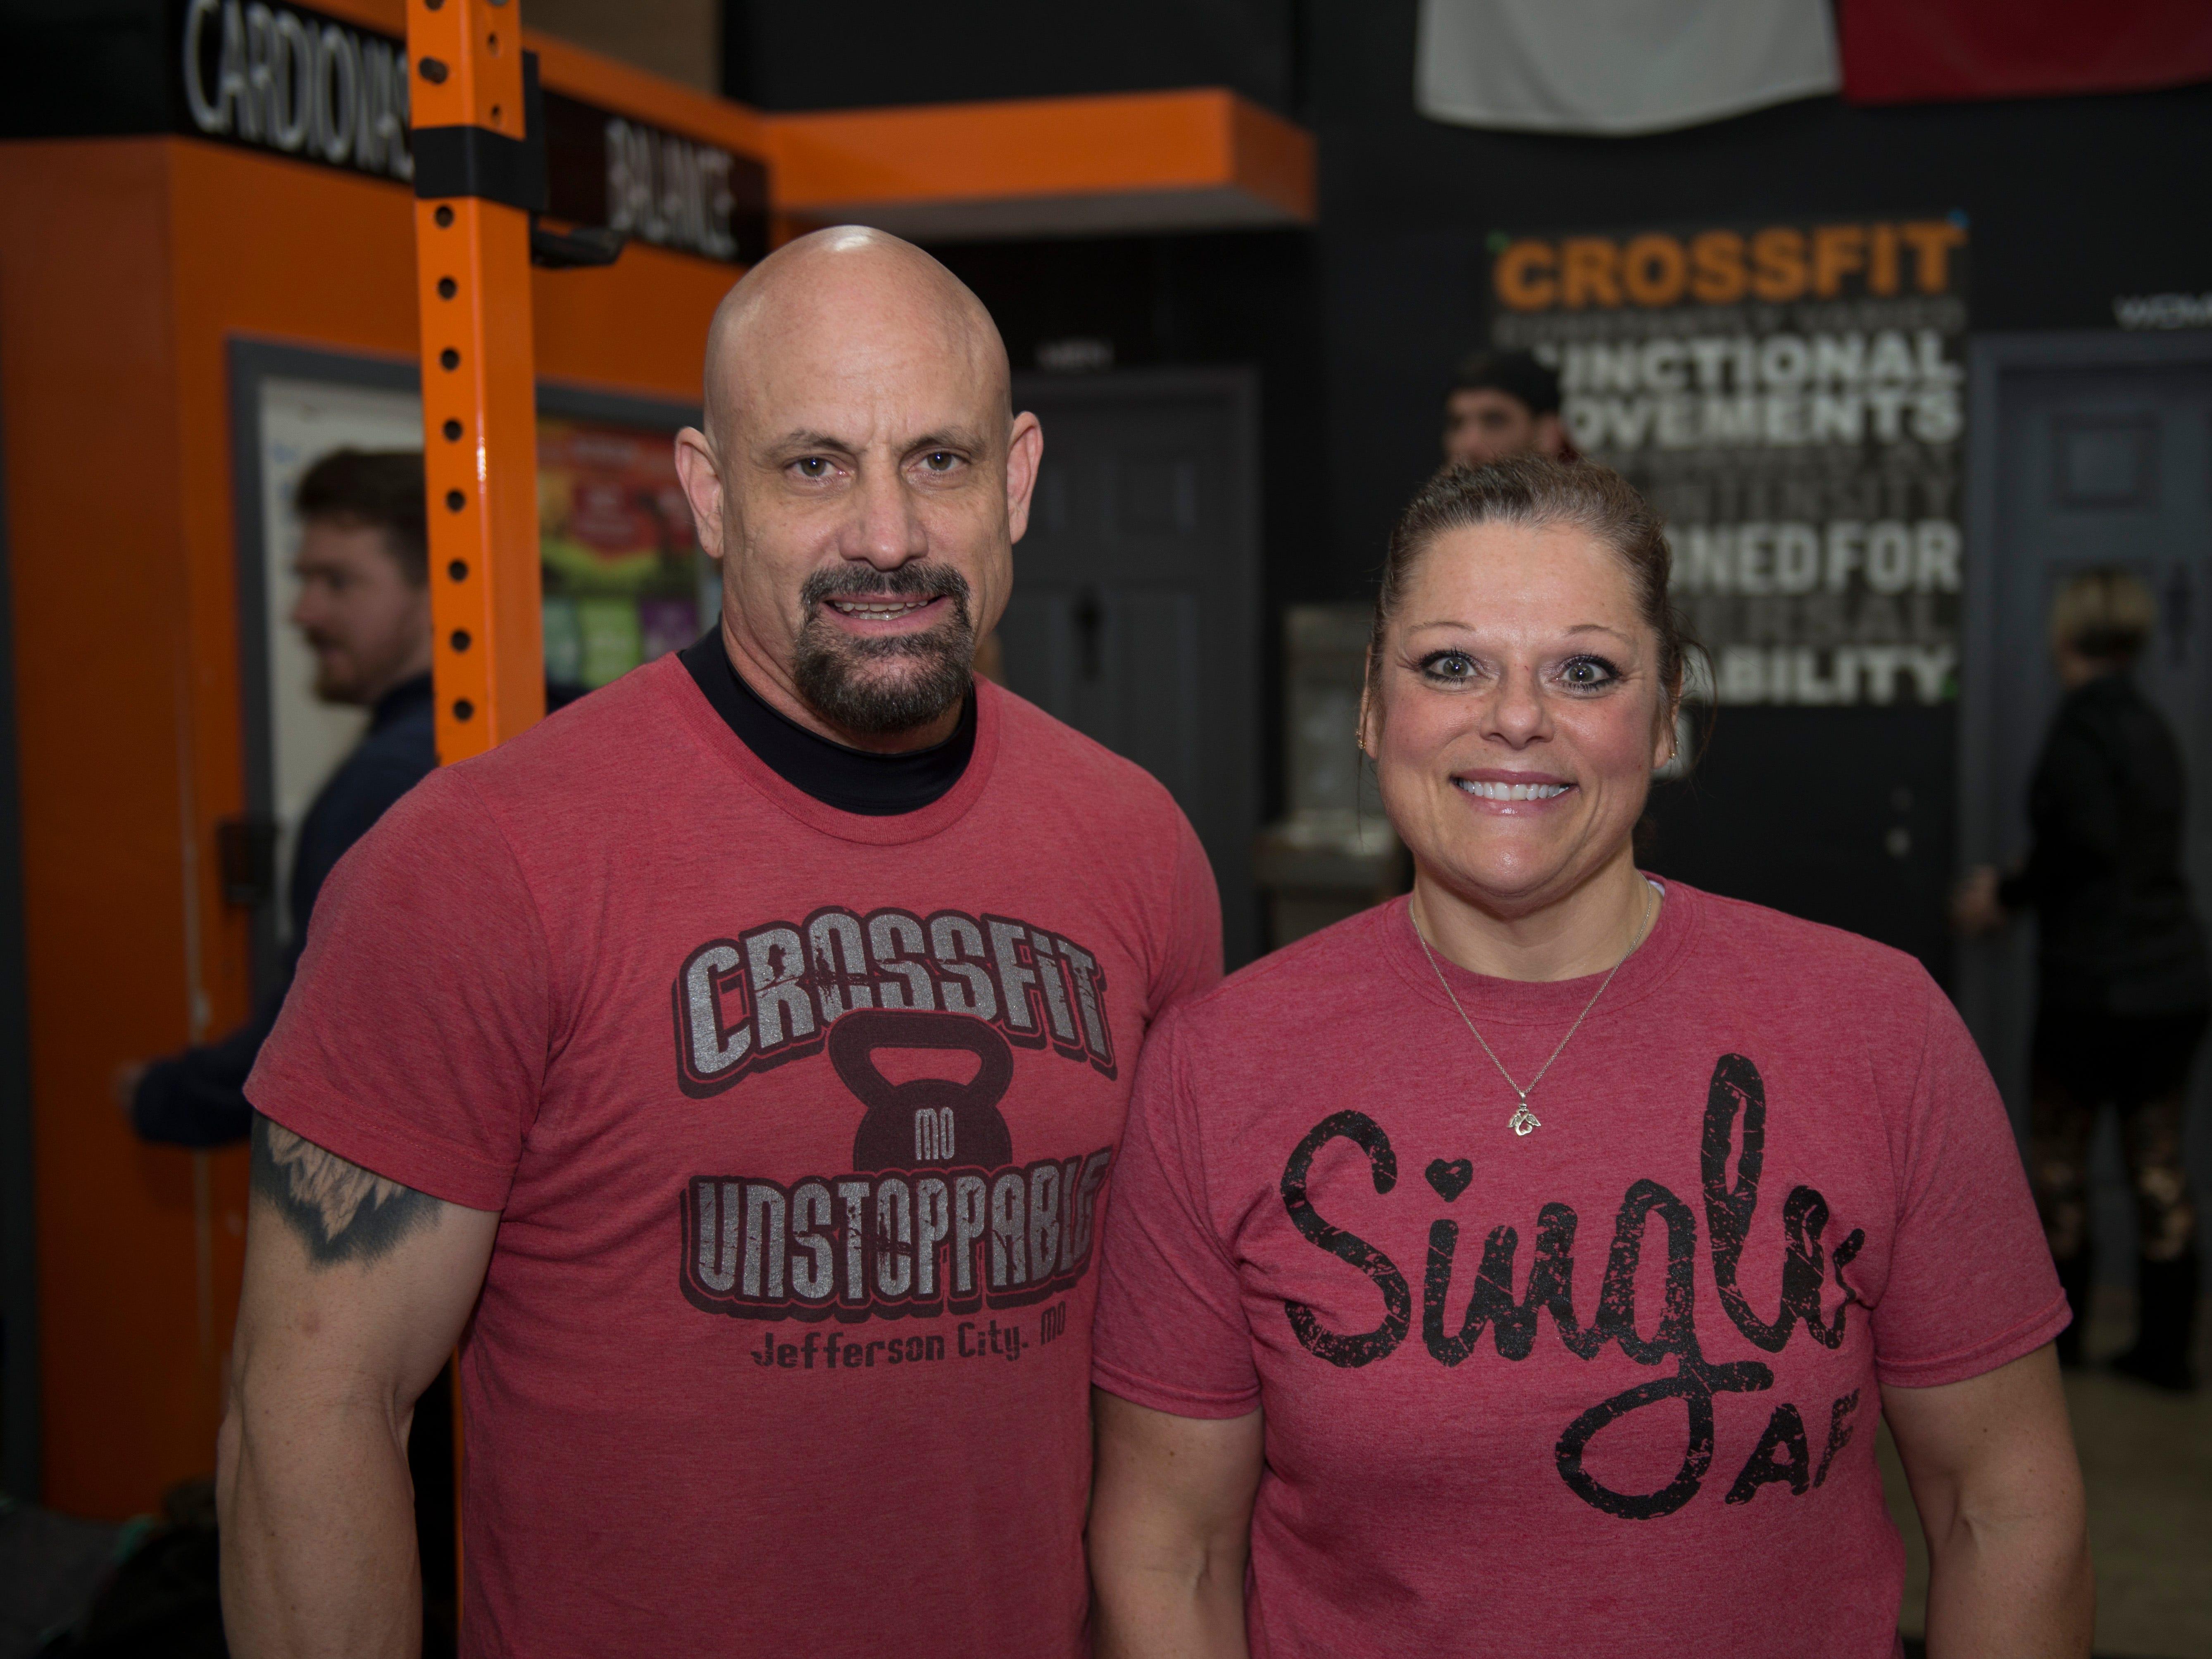 Gina Henley and Shawn Bruce